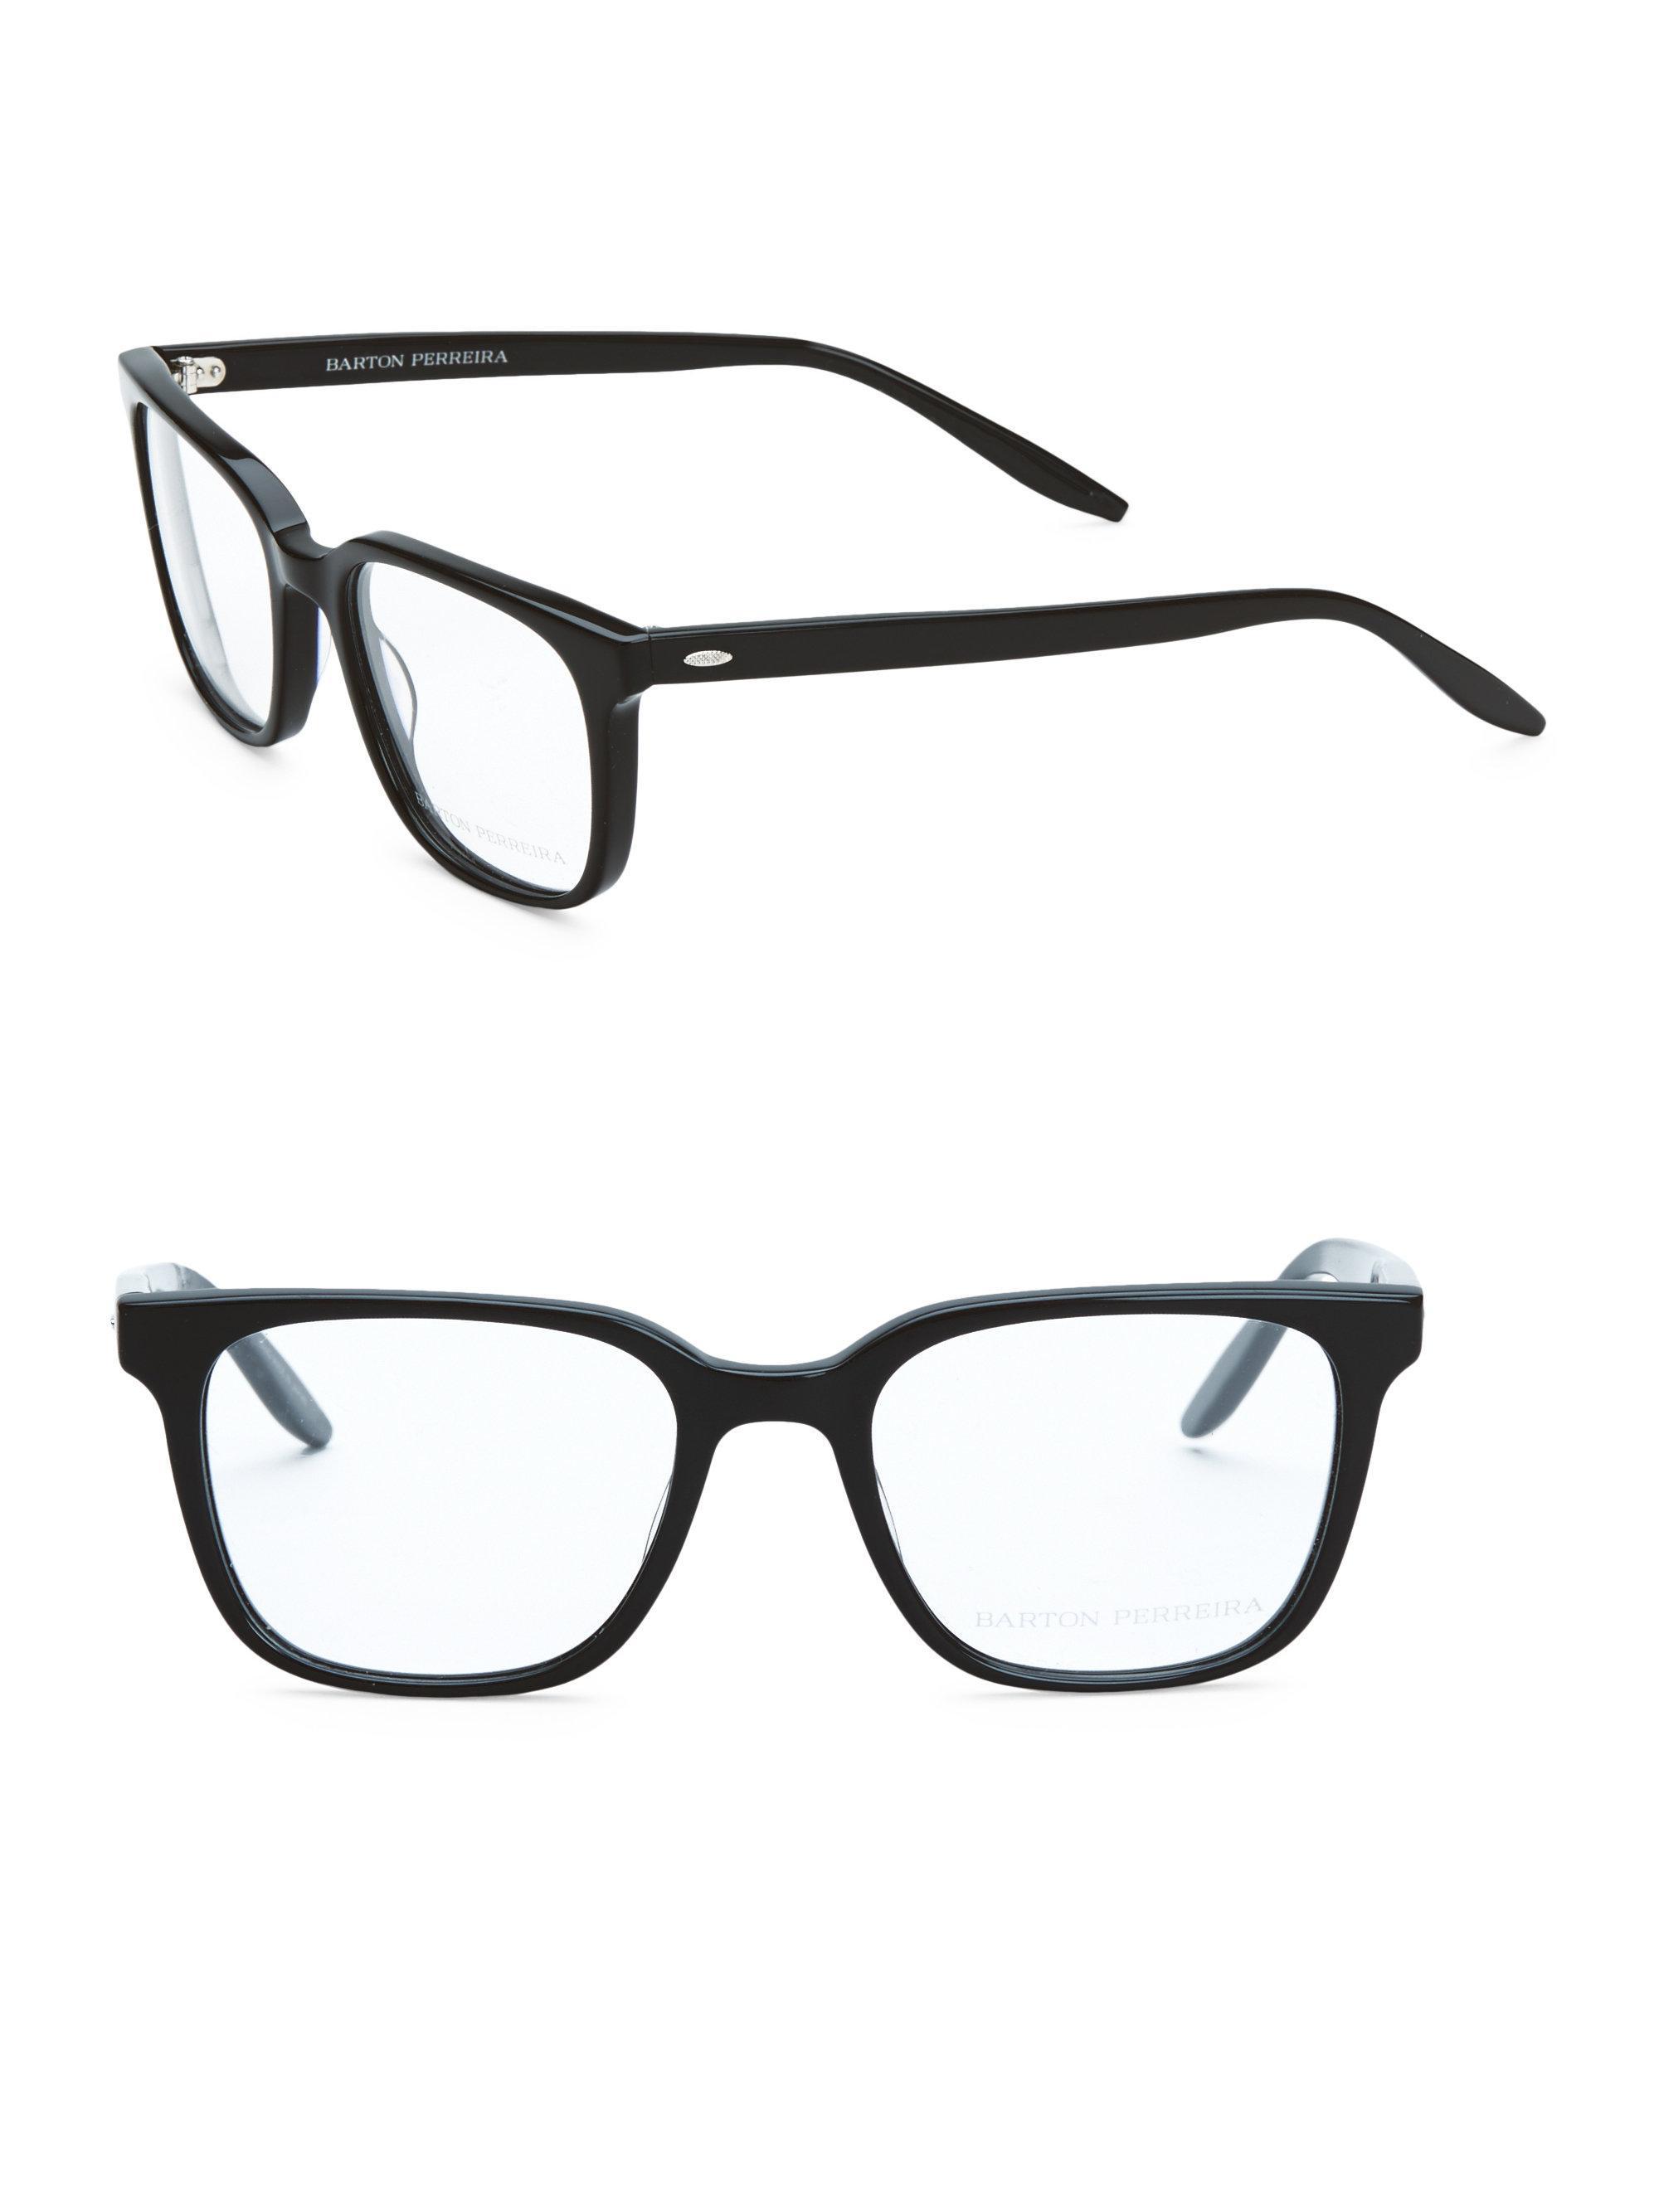 9010486073 Barton Perreira Joe Black 52mm Optical Glasses in Black for Men - Lyst